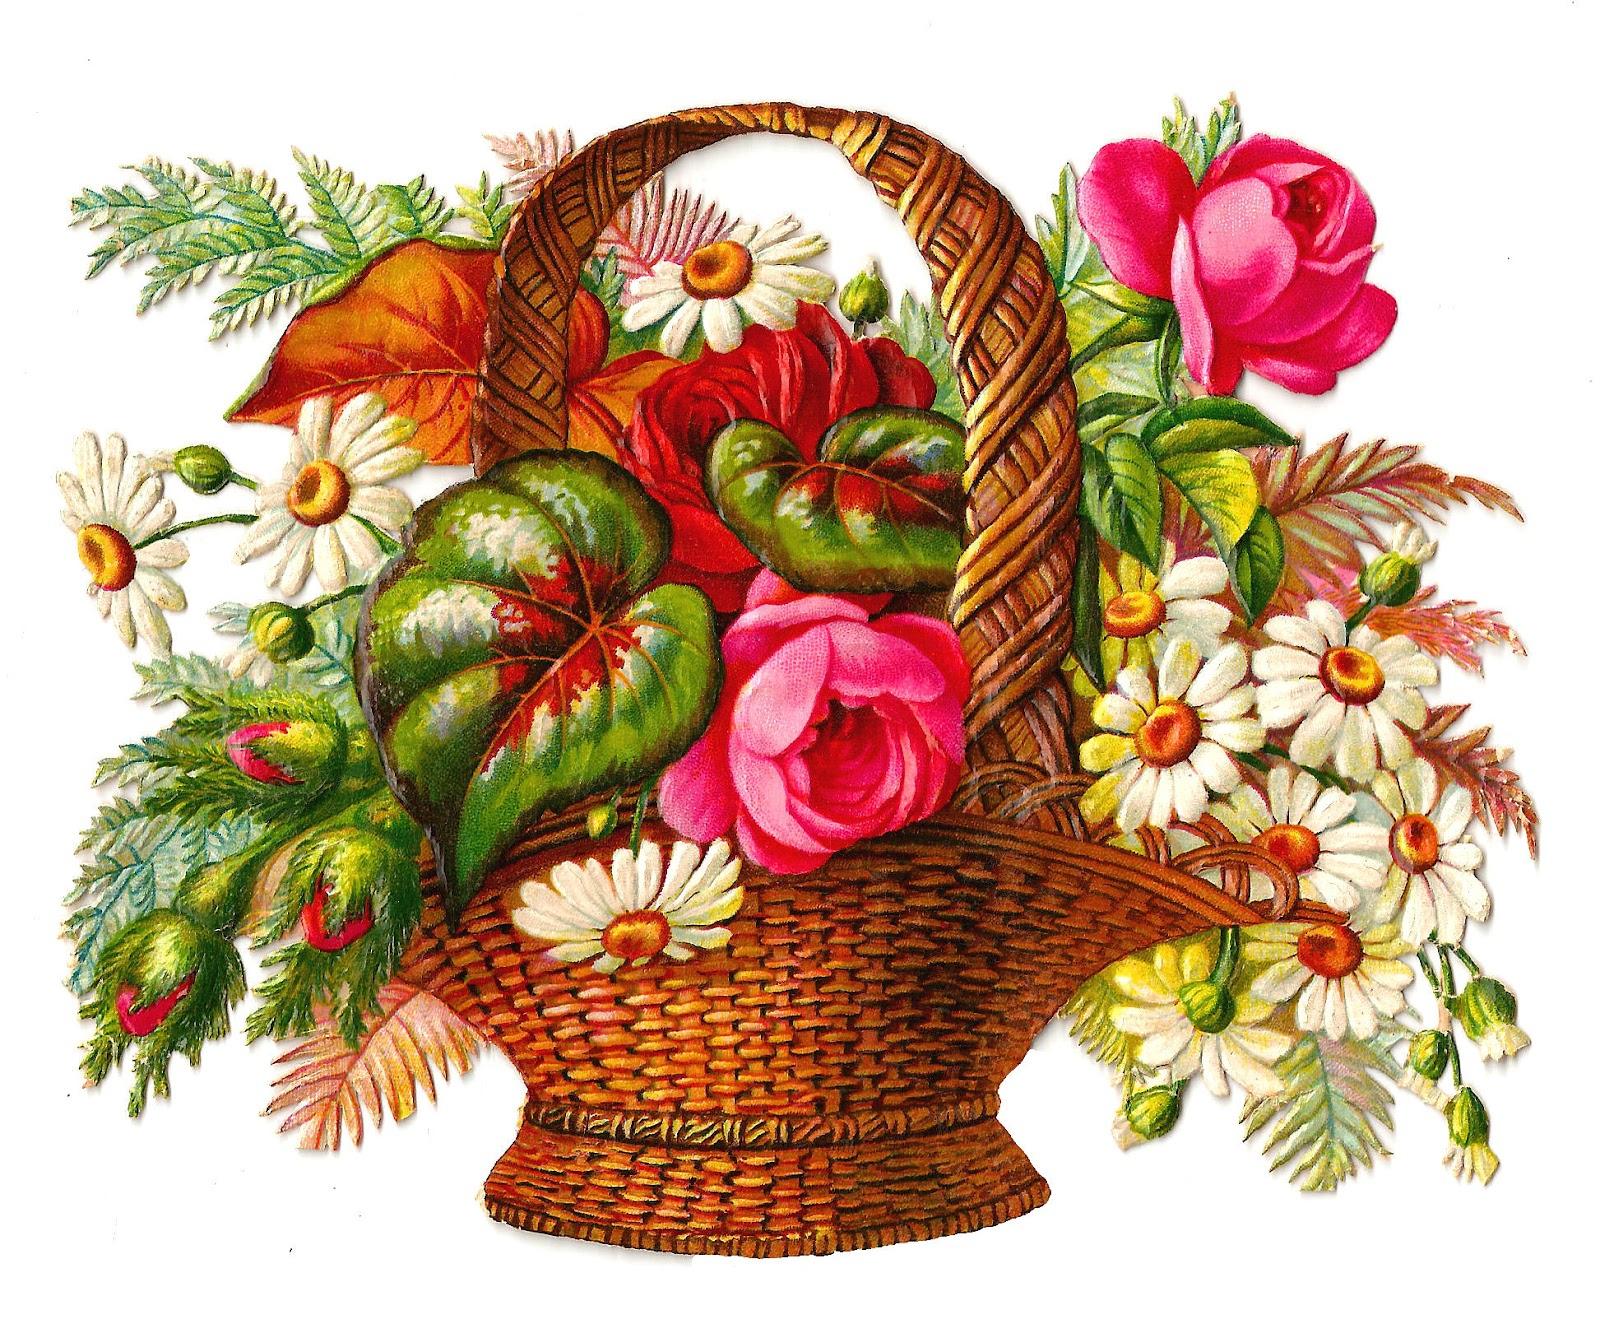 1600x1329 Flower Basket Images Drawing Drawings Flower Basket Pencil